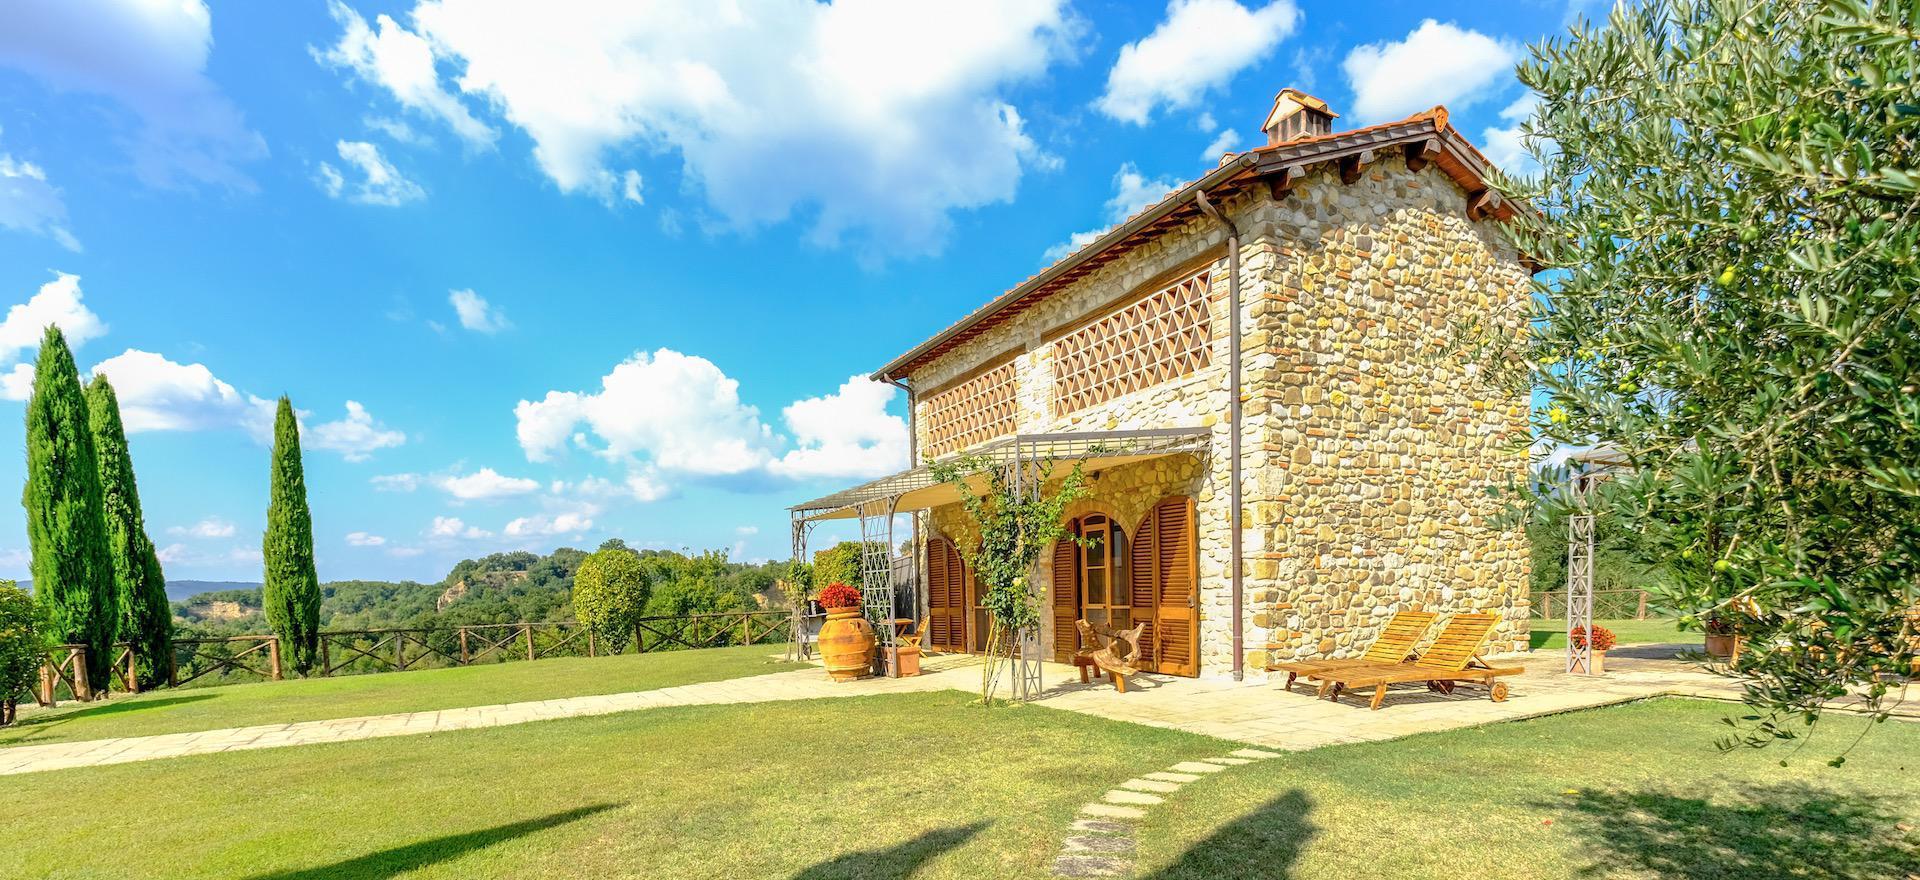 Agriturismo Toscana Agriturismo nella bellissima tenuta vicino a Firenze